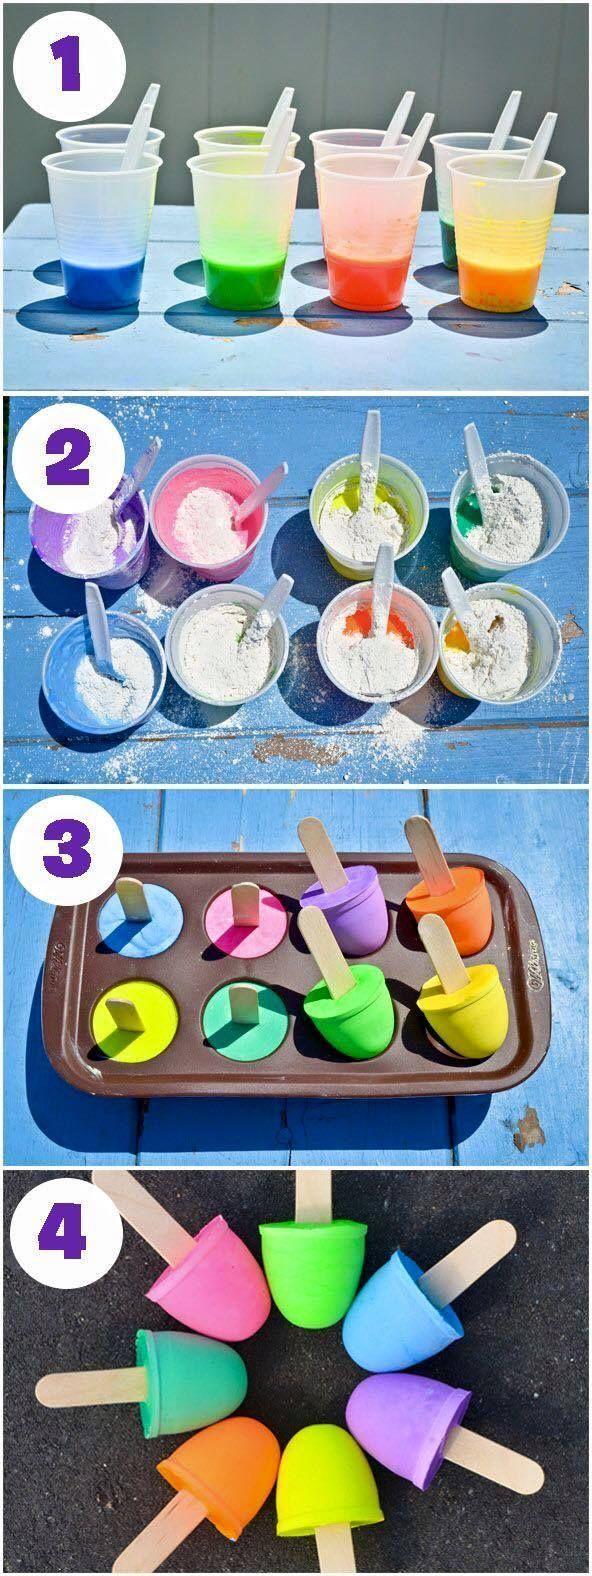 How to make sidewalk chalk POPS